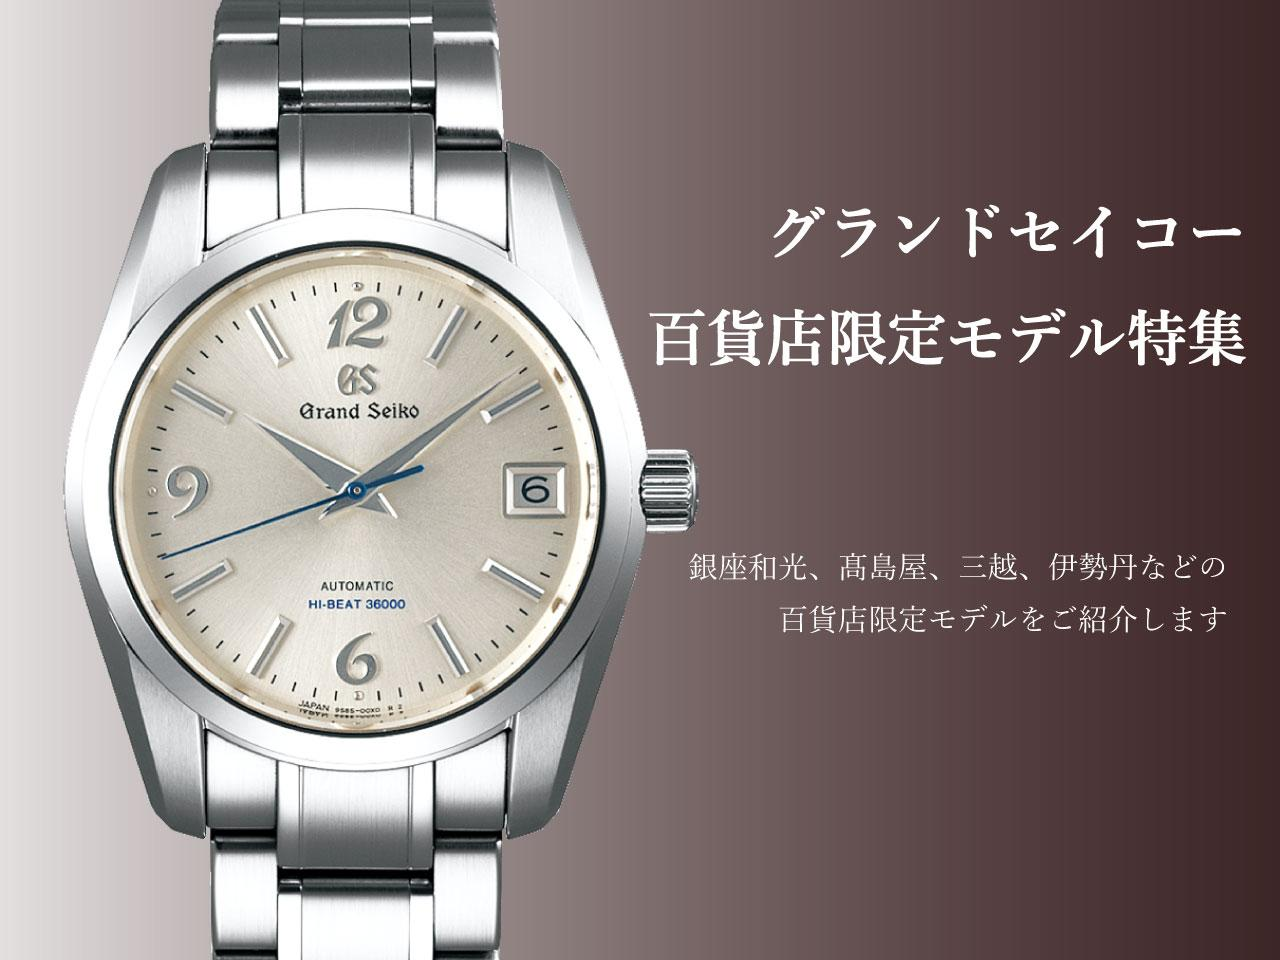 finest selection 6ee33 710a2 グランドセイコー百貨店限定モデル特集まとめ ピアゾ(PiAZO)